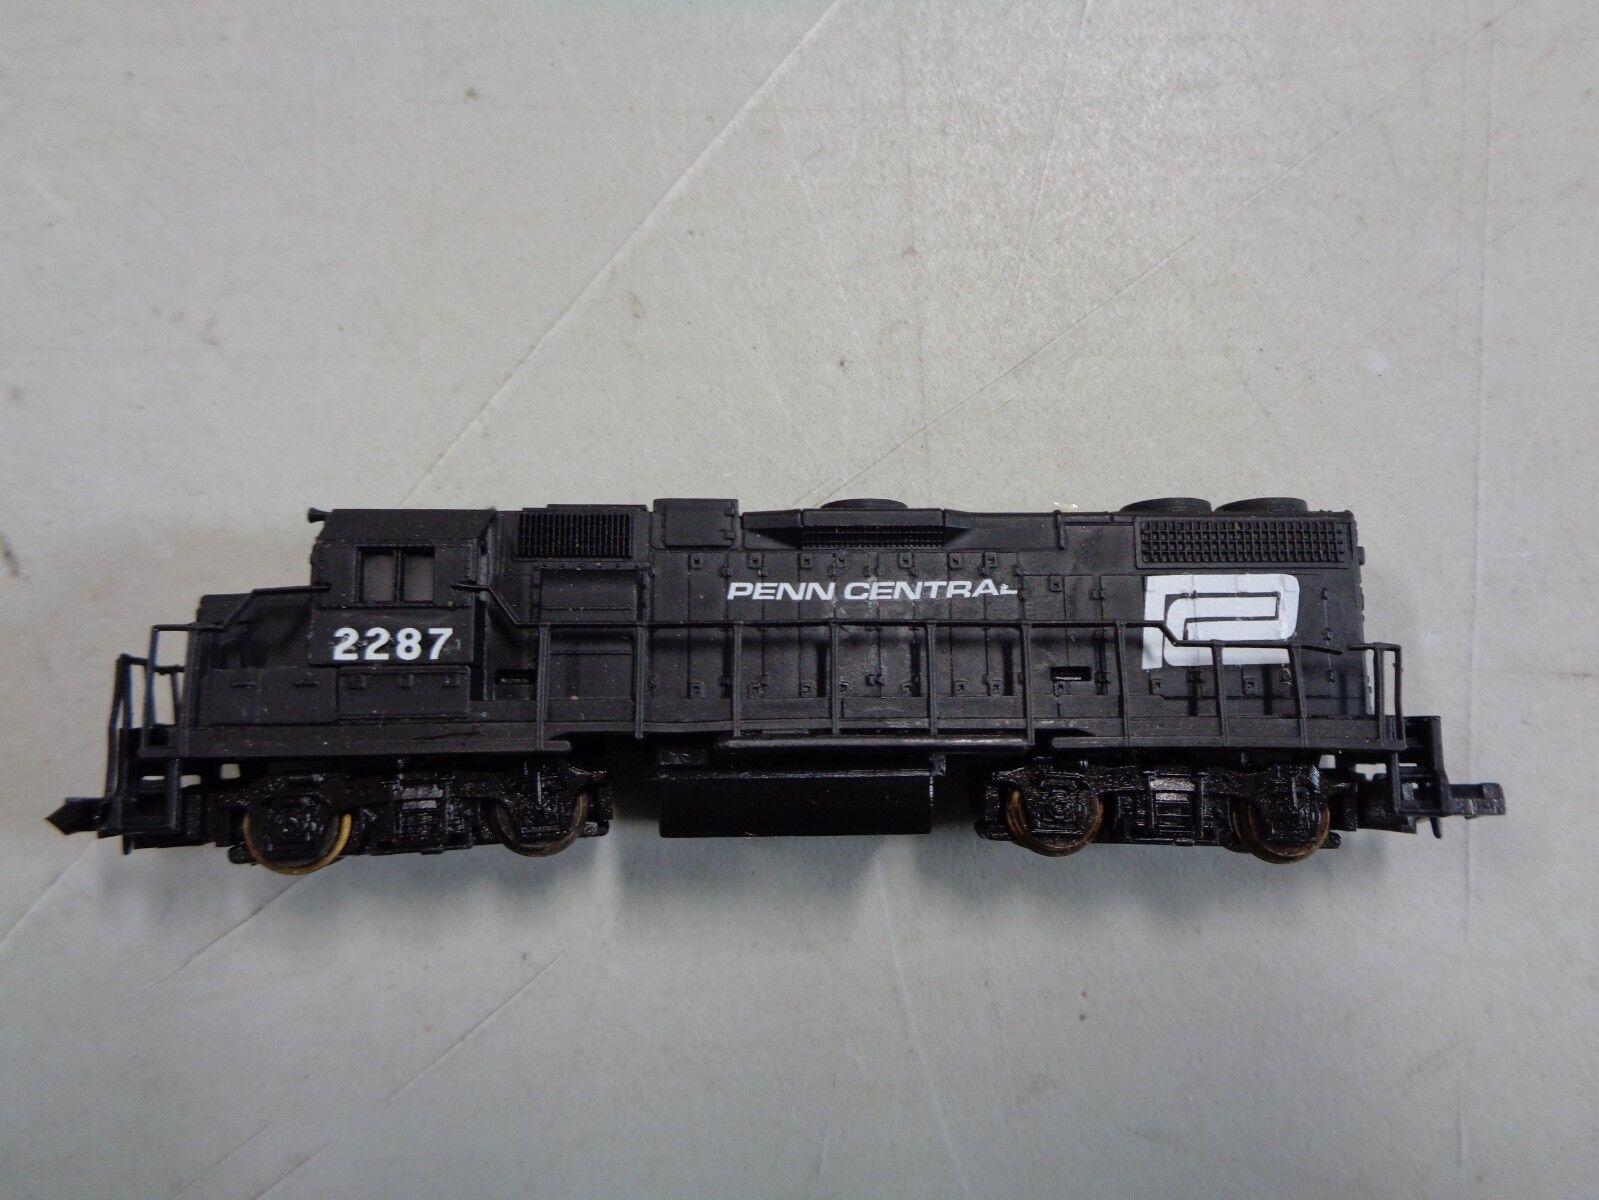 Life Like Trains Penn Central 2287 Locomotive N Scale